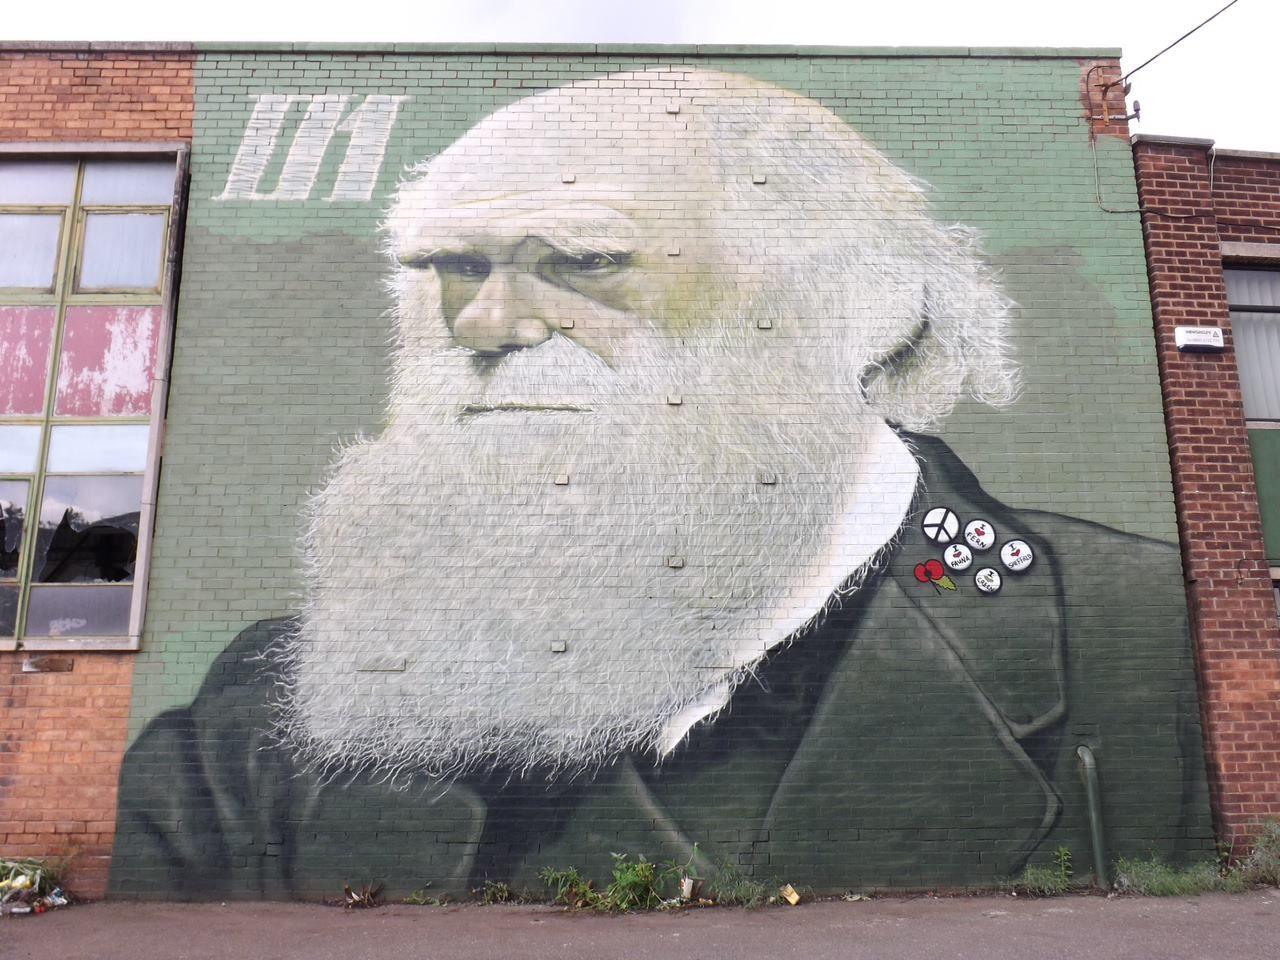 rocket-01-surrealism-propaganza-urban-artist-graffiti-graff-street-art-spray-painting-belgique-uk-1280x960.jpg